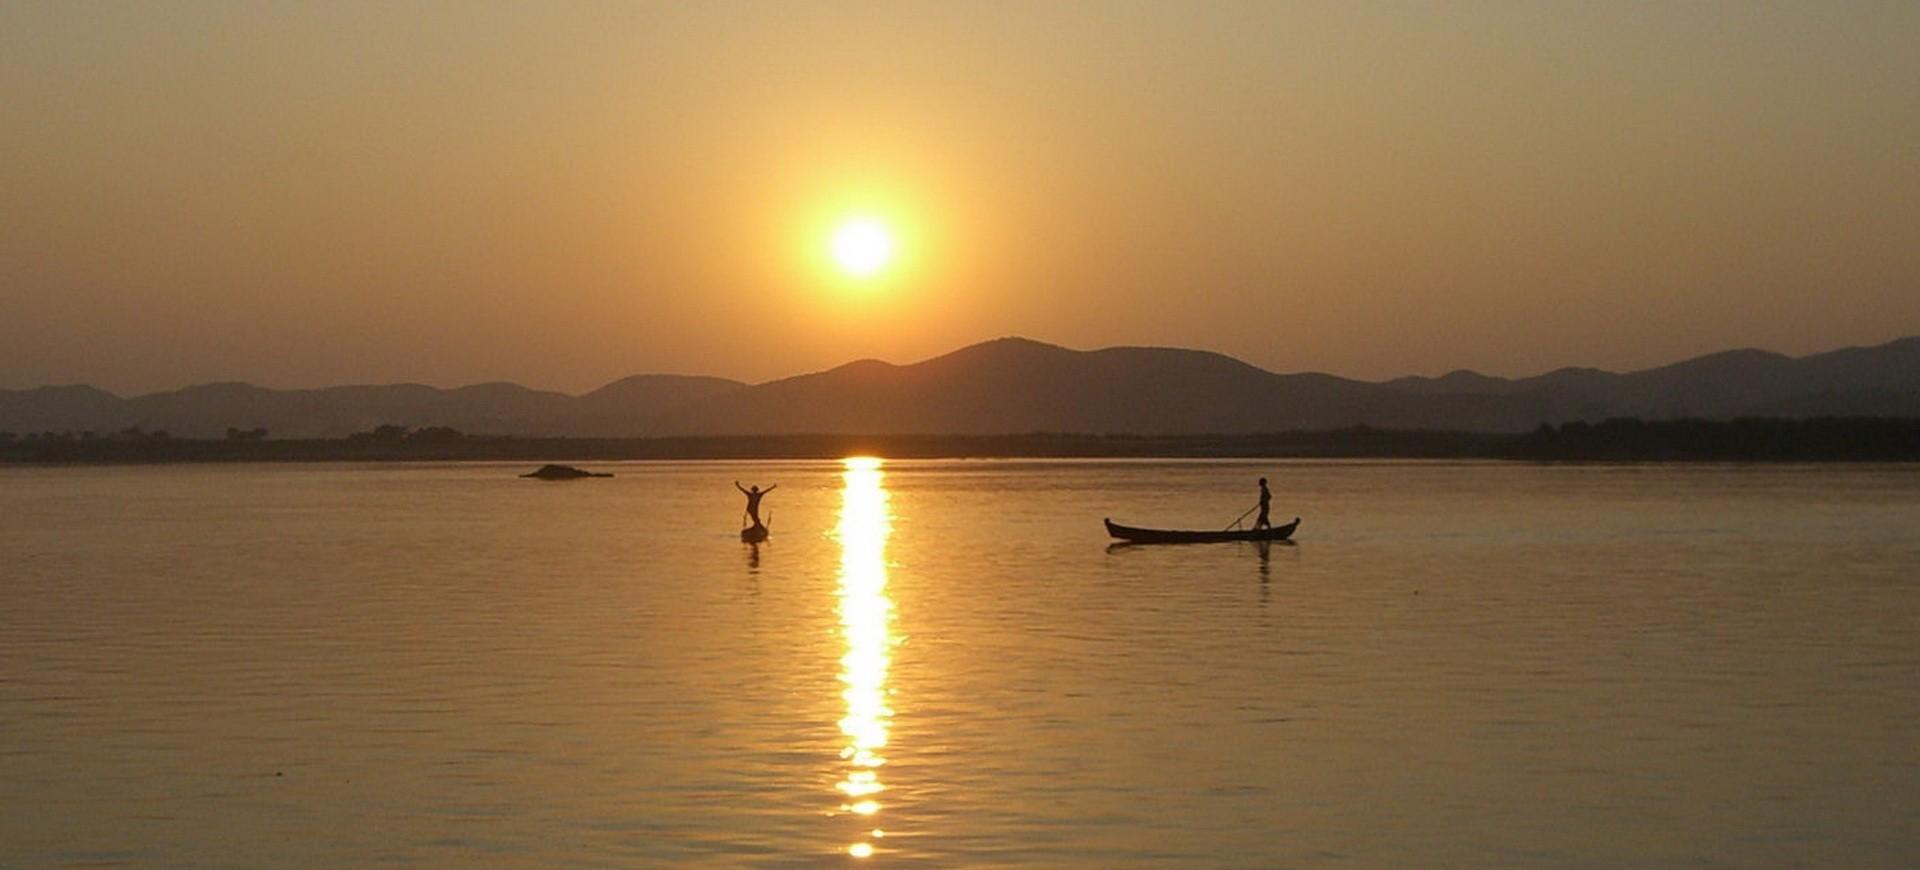 Birmanie Lac Inlé coucher du soleil